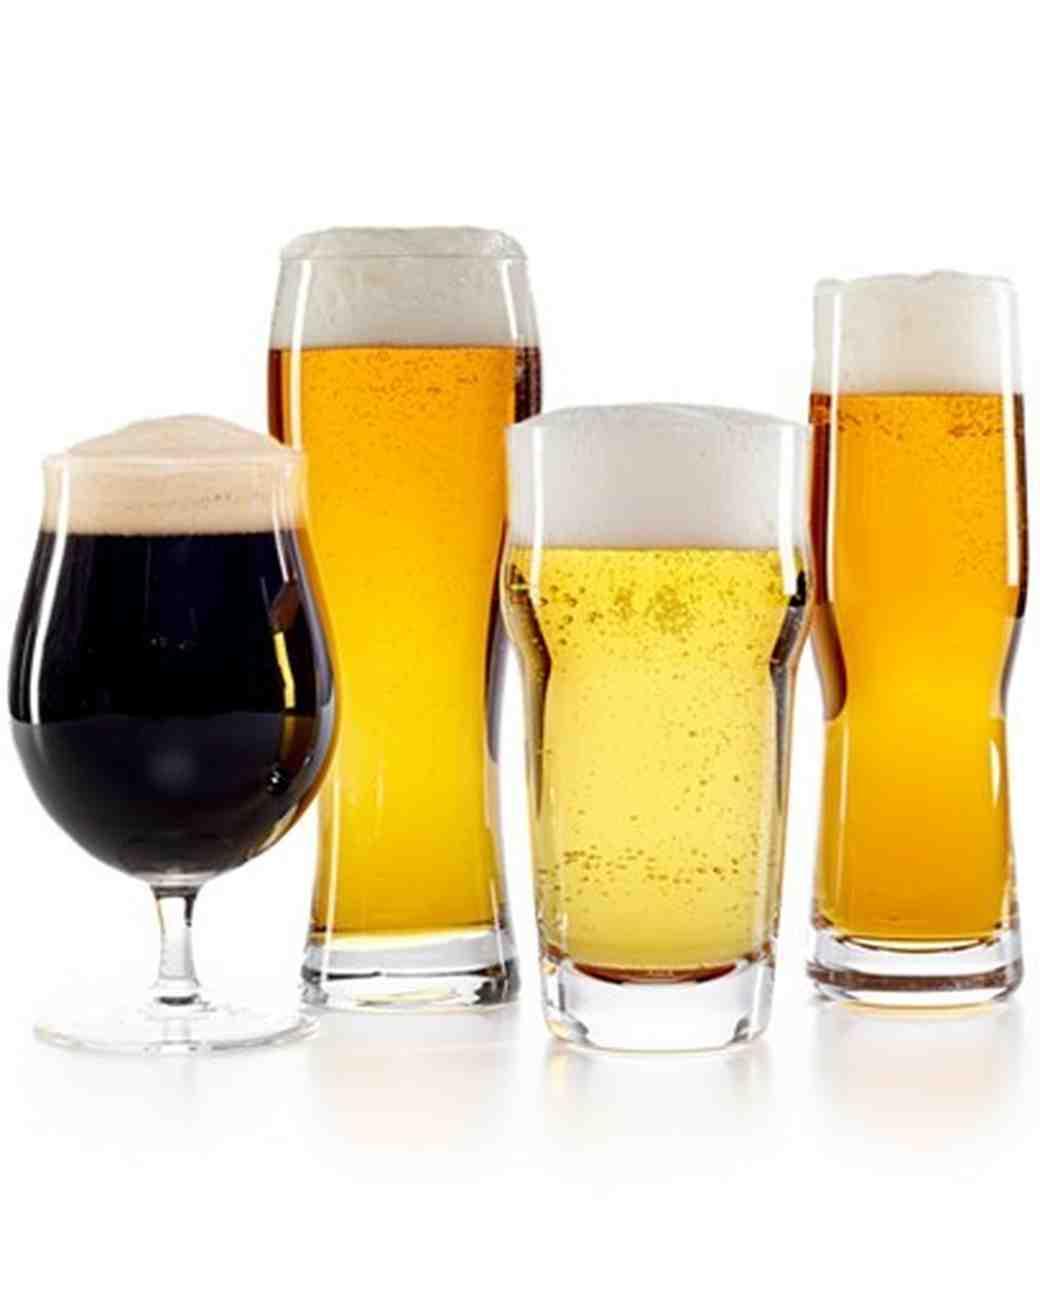 assorted beer glasses